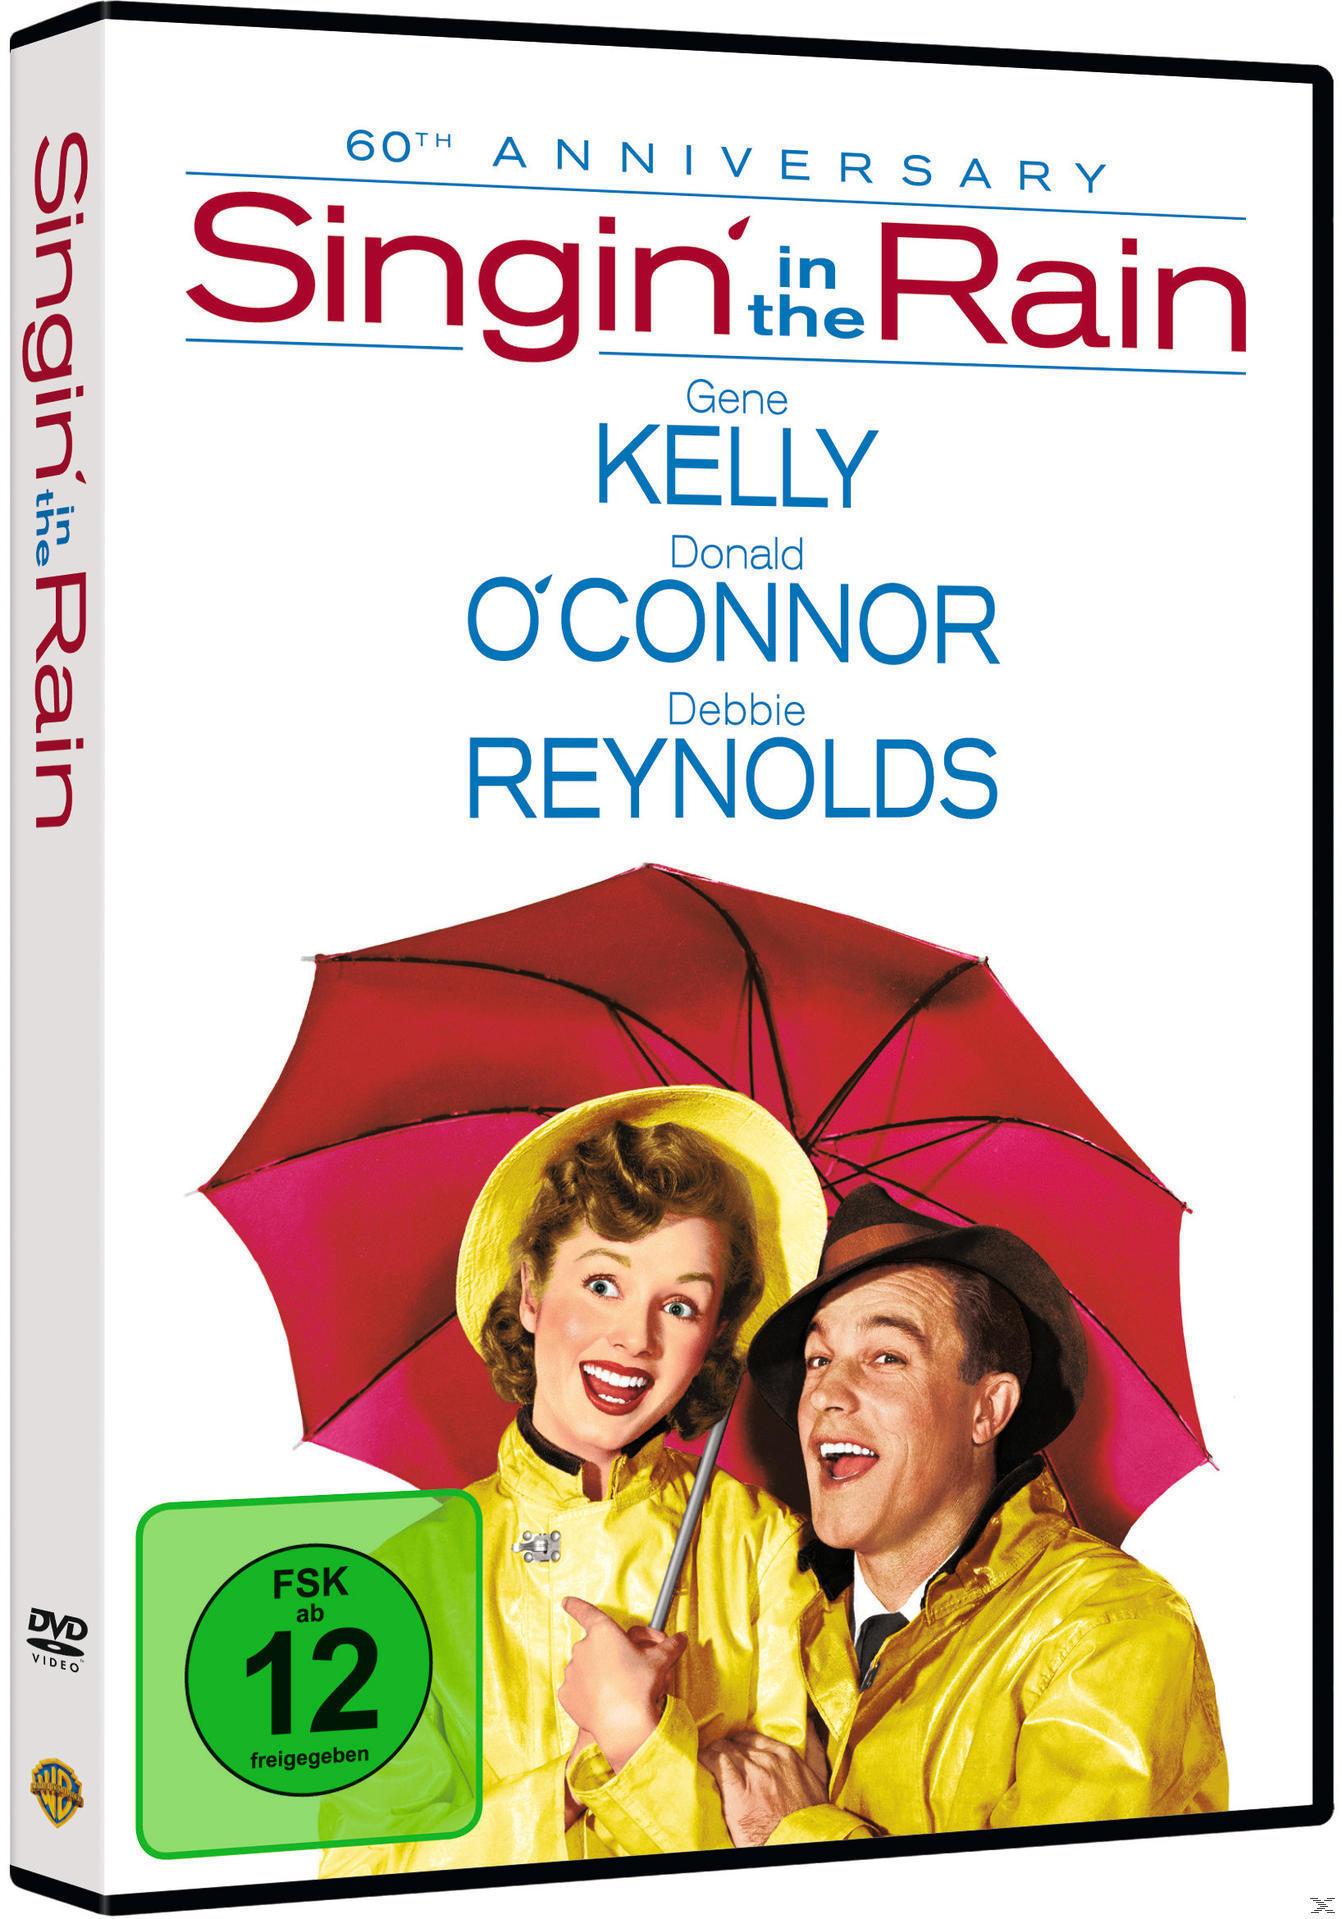 Singin' in the Rain Anniversary Edition (DVD) für 8,76 Euro